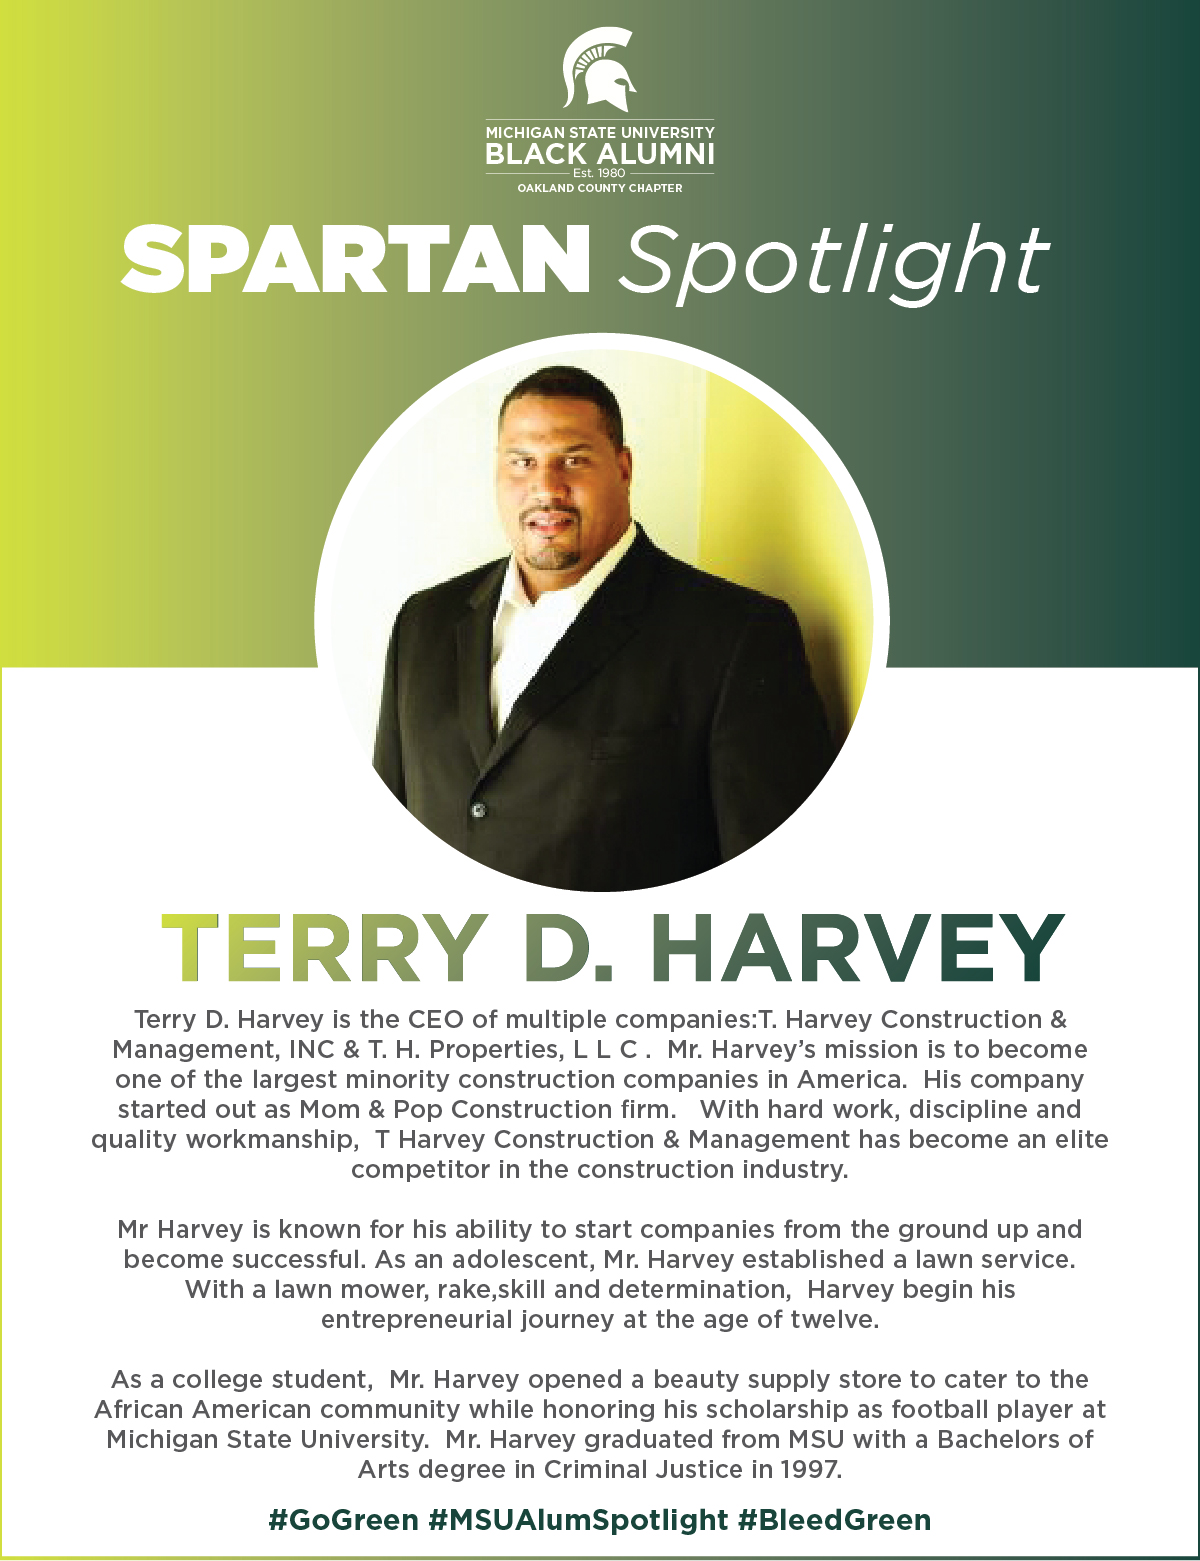 MSUBAOC Spartan Spotlight Terry D